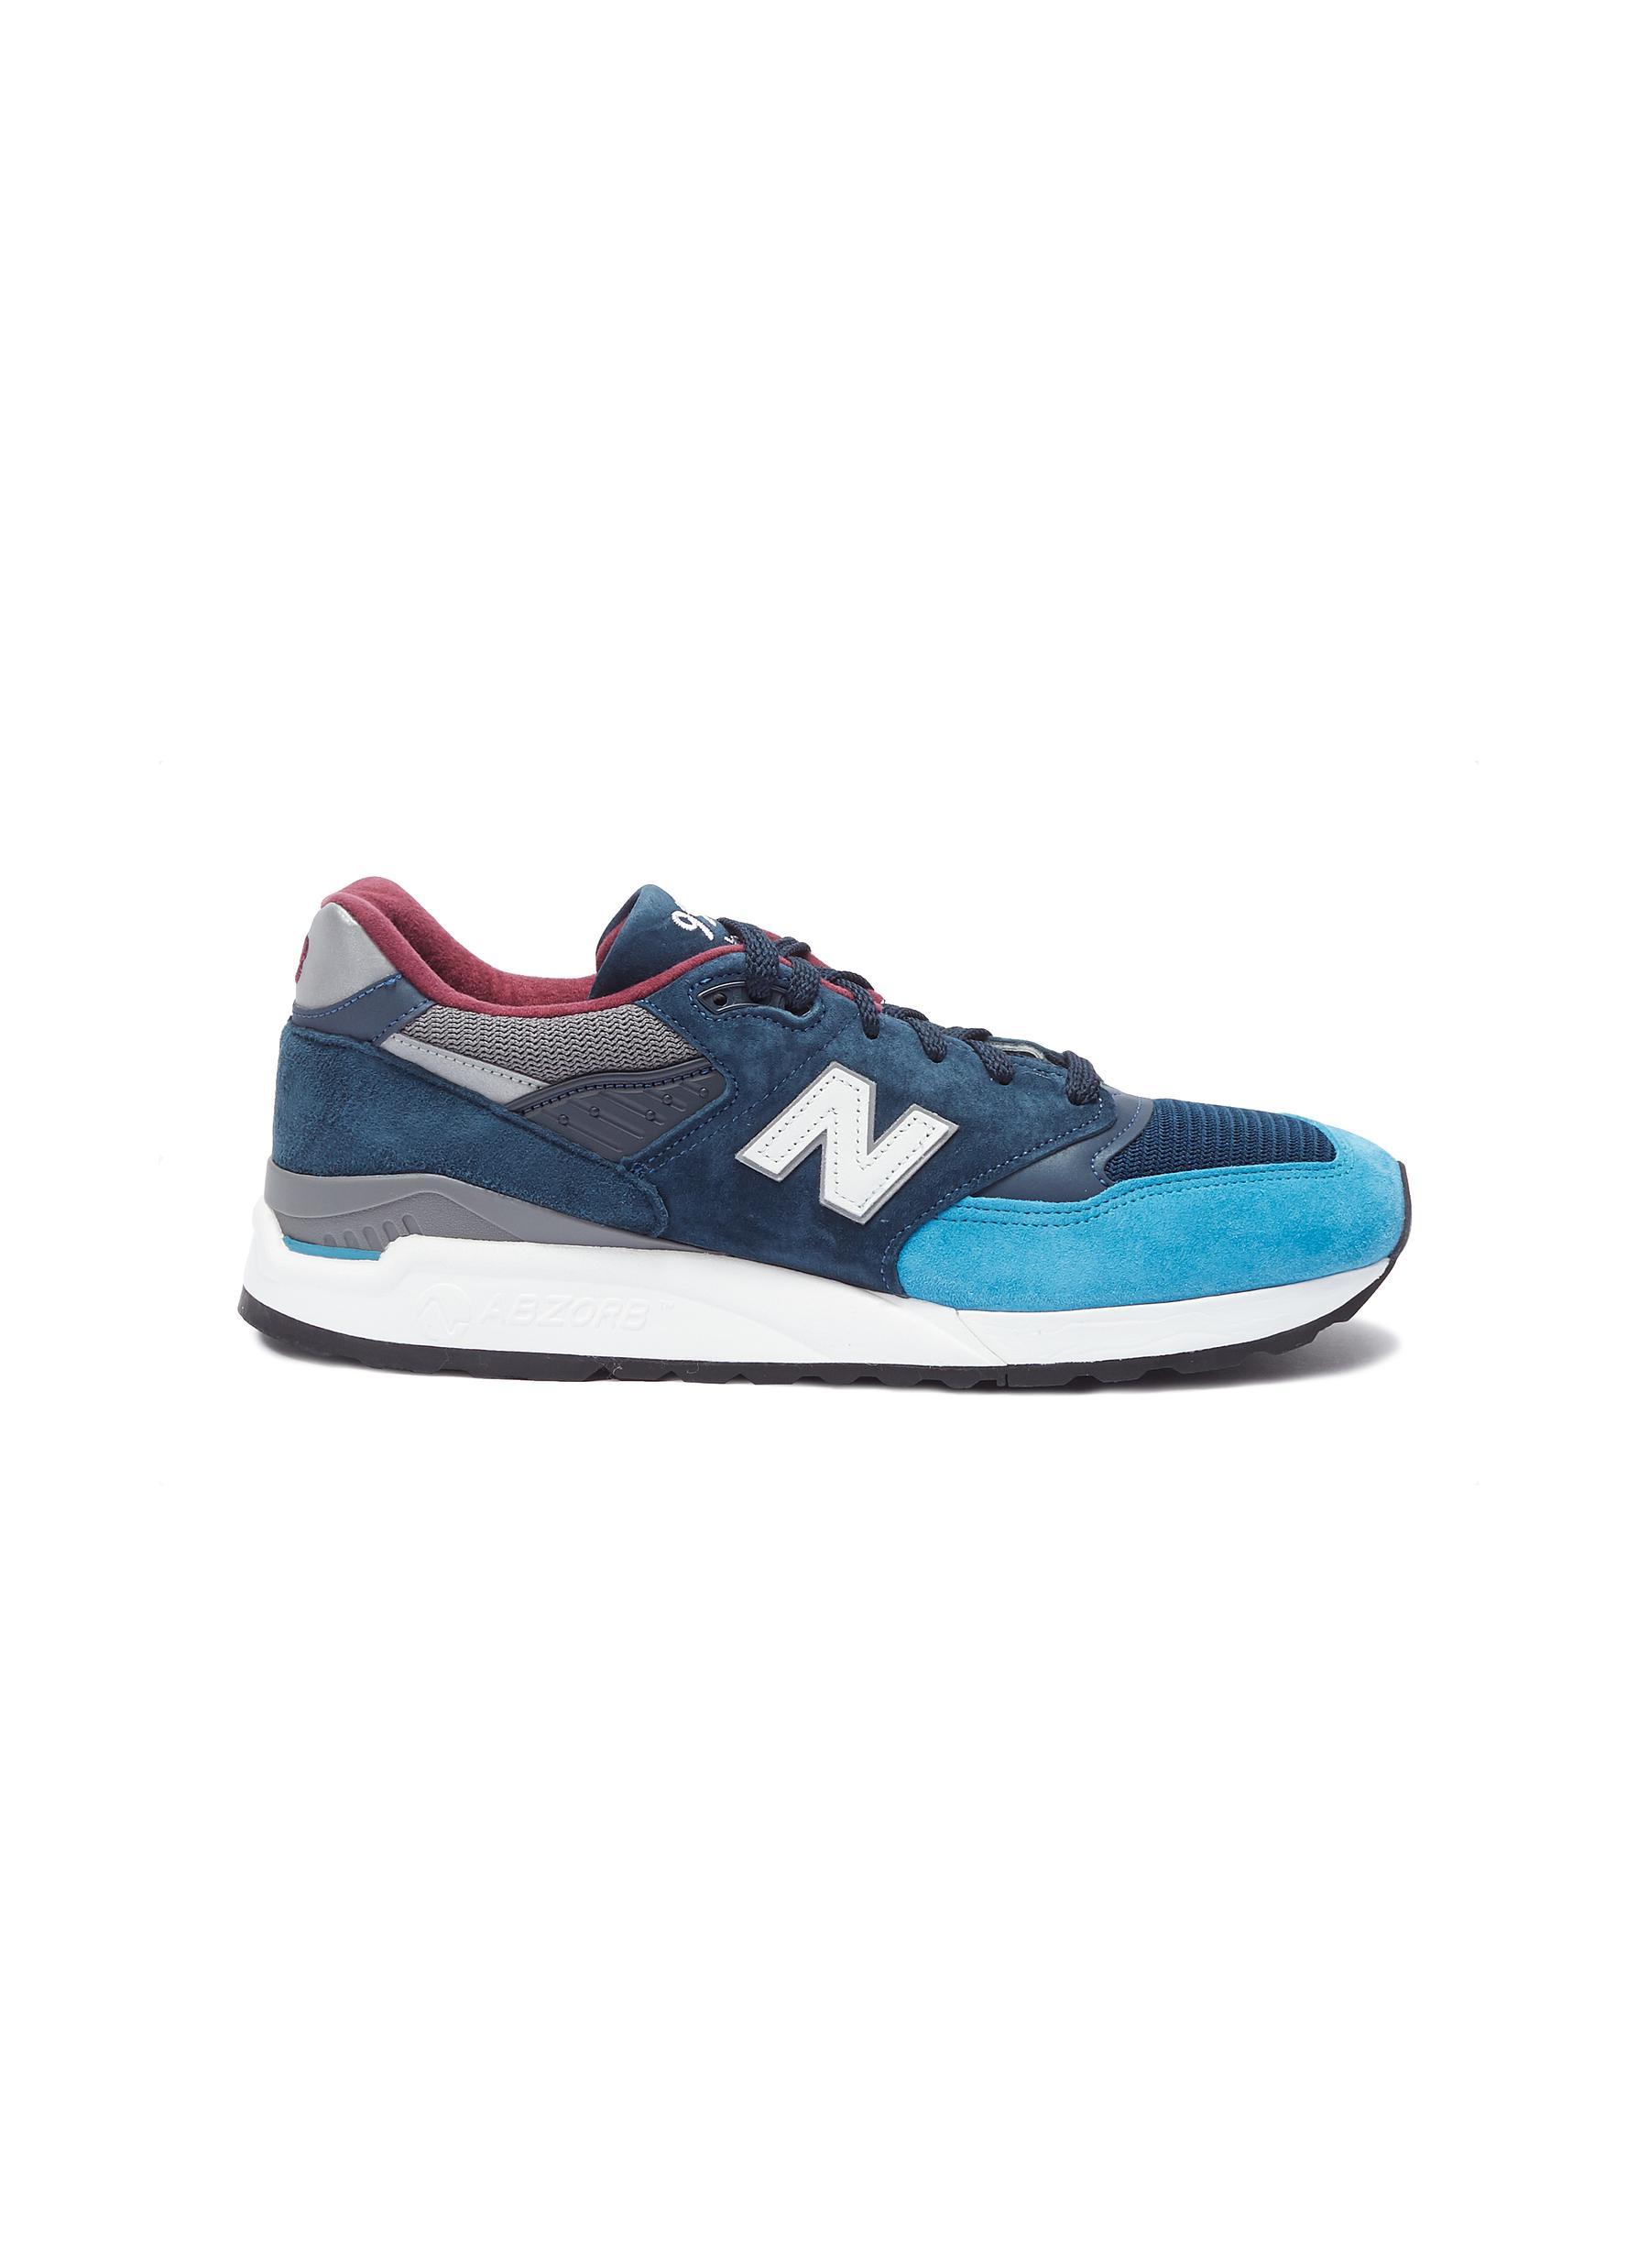 check out b0c57 86876 Balance Sneakers  miusa Suede Lane 998  New Colourblock 男士 qSTPXxw